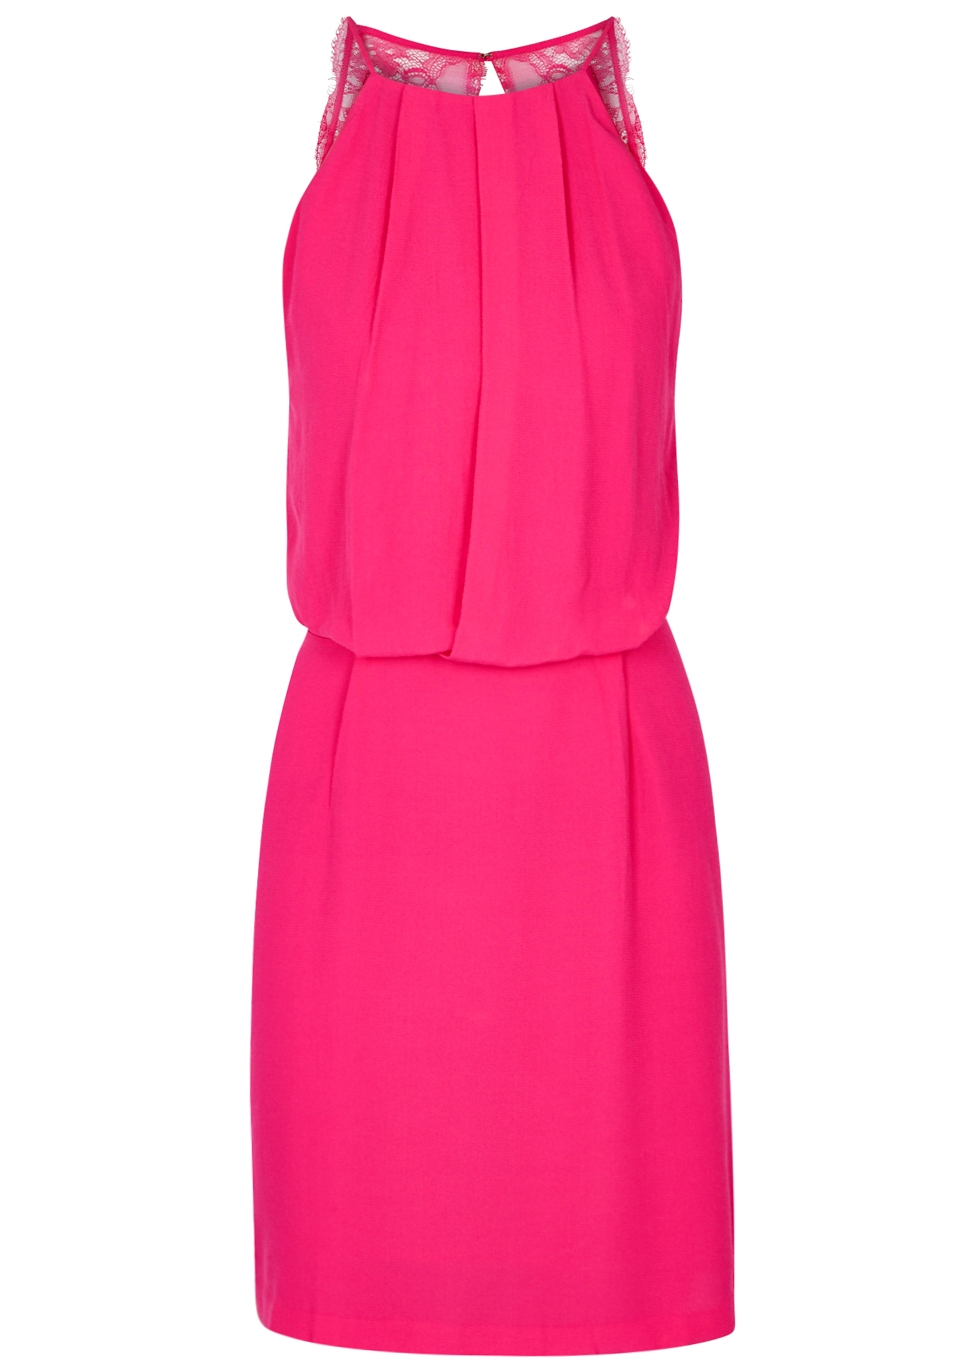 SAMS0E & SAMS0E Willow Fuchsia Open-Back Dress in Pink